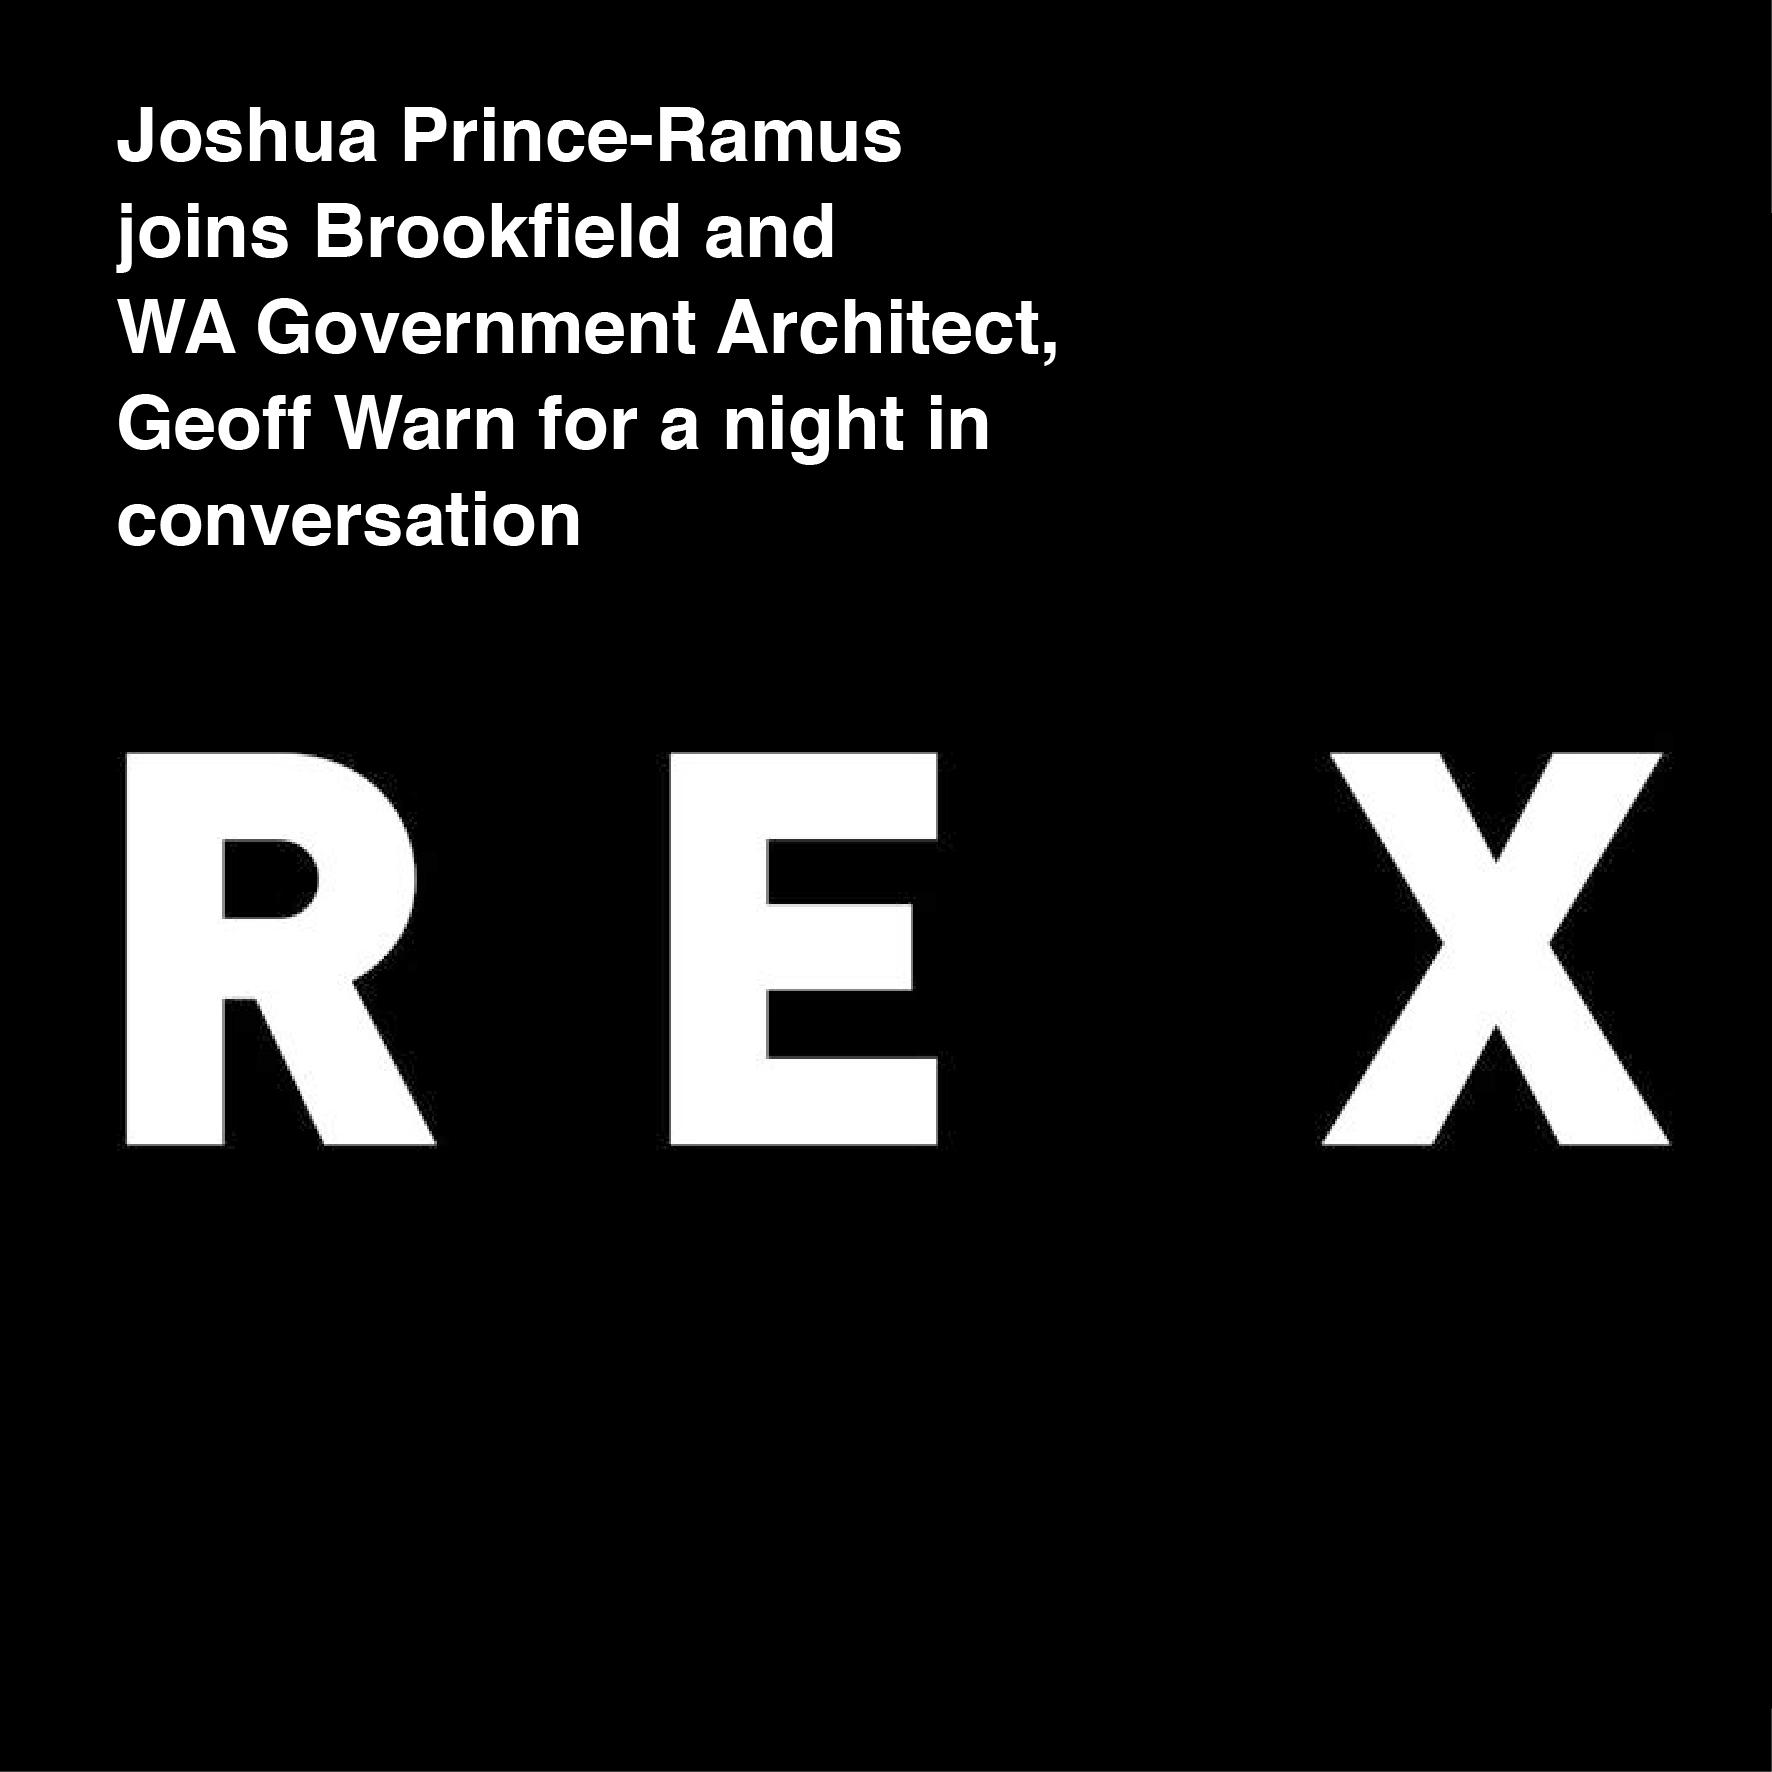 REX_perth_architecture_talk_design.jpg